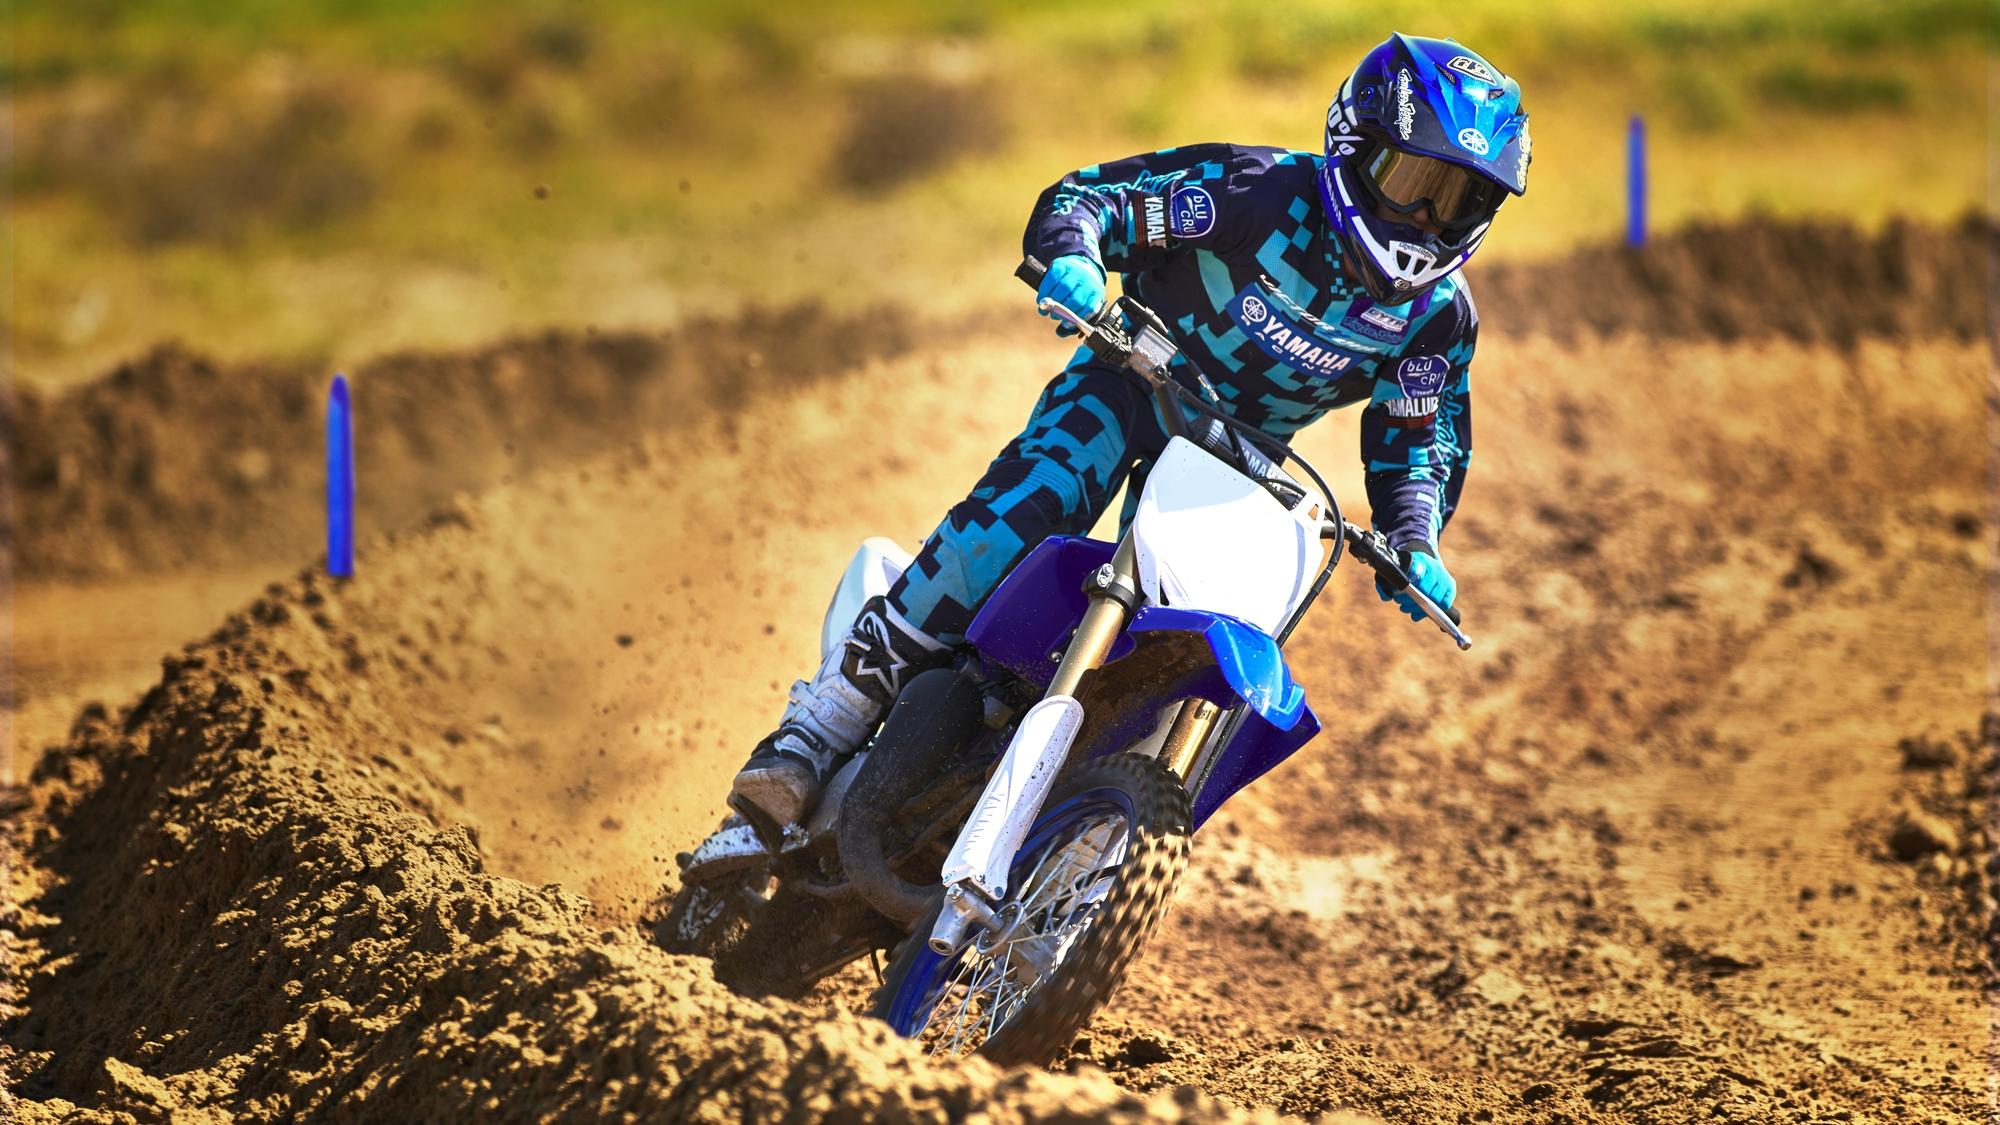 Yz85 2019 motociclos yamaha motor portugal esconder anterior seguinte download imagem fandeluxe Image collections